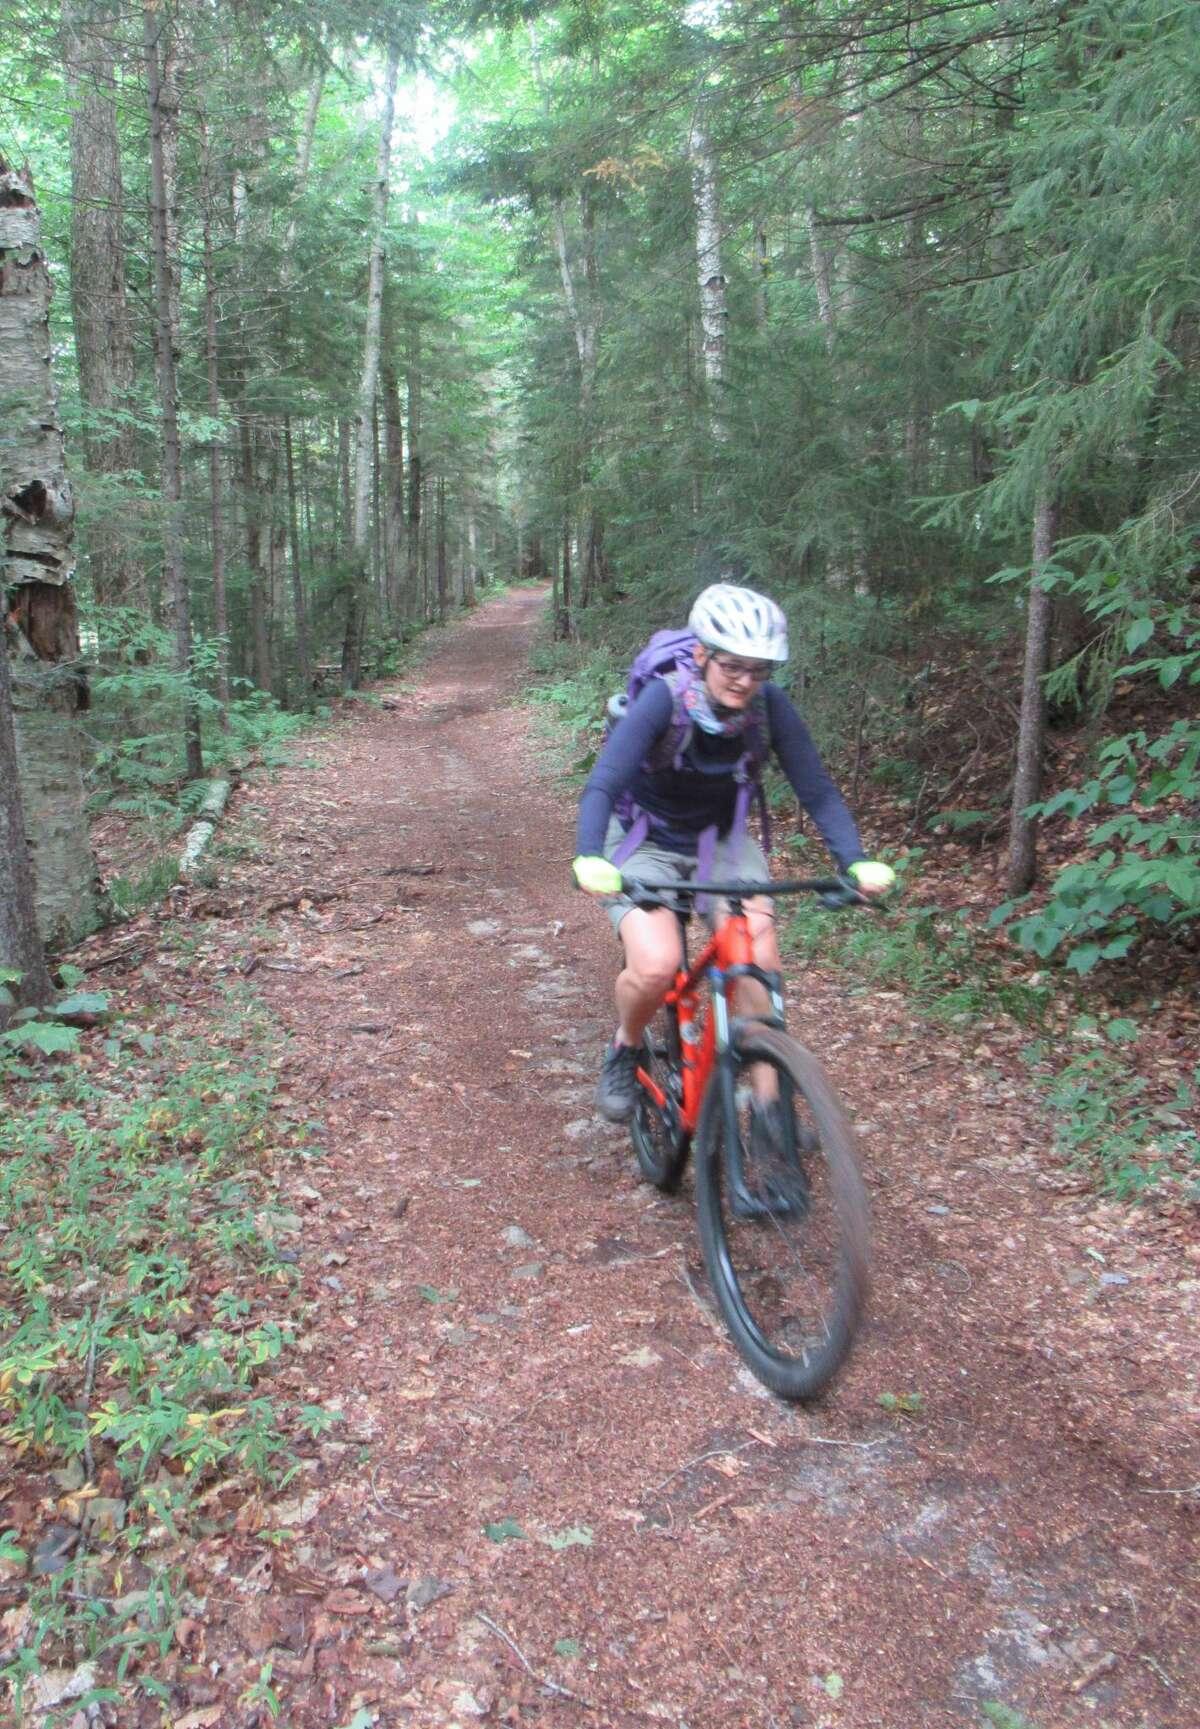 Outdoor writer Gillian Scott rides a doubletrack mountain bike trail near Inlet. (Herb Terns / Times Union)